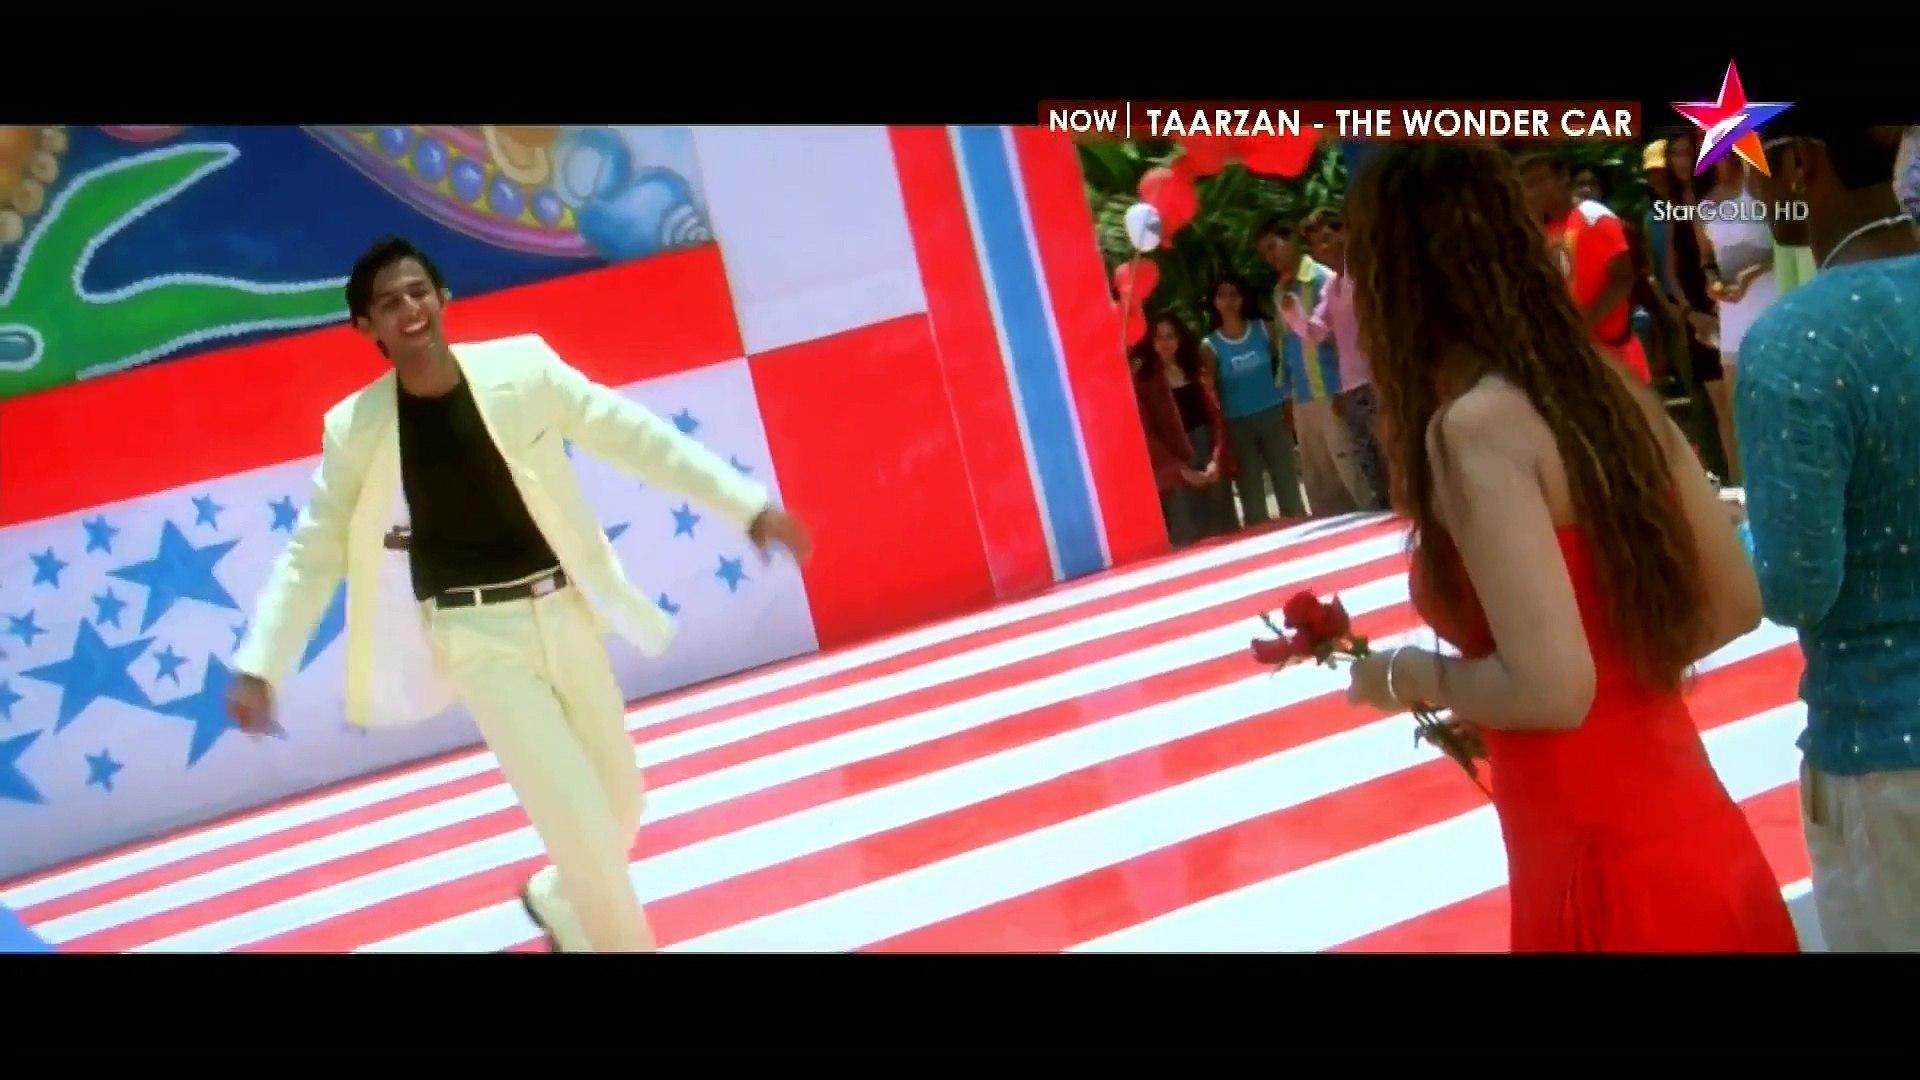 Oh Lala Re 1080p Hd Taarzan The Wonder Car 2004 Video Dailymotion